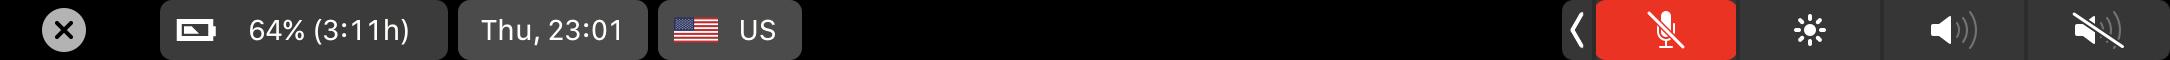 screenshot 2018-04-05 23 01 11